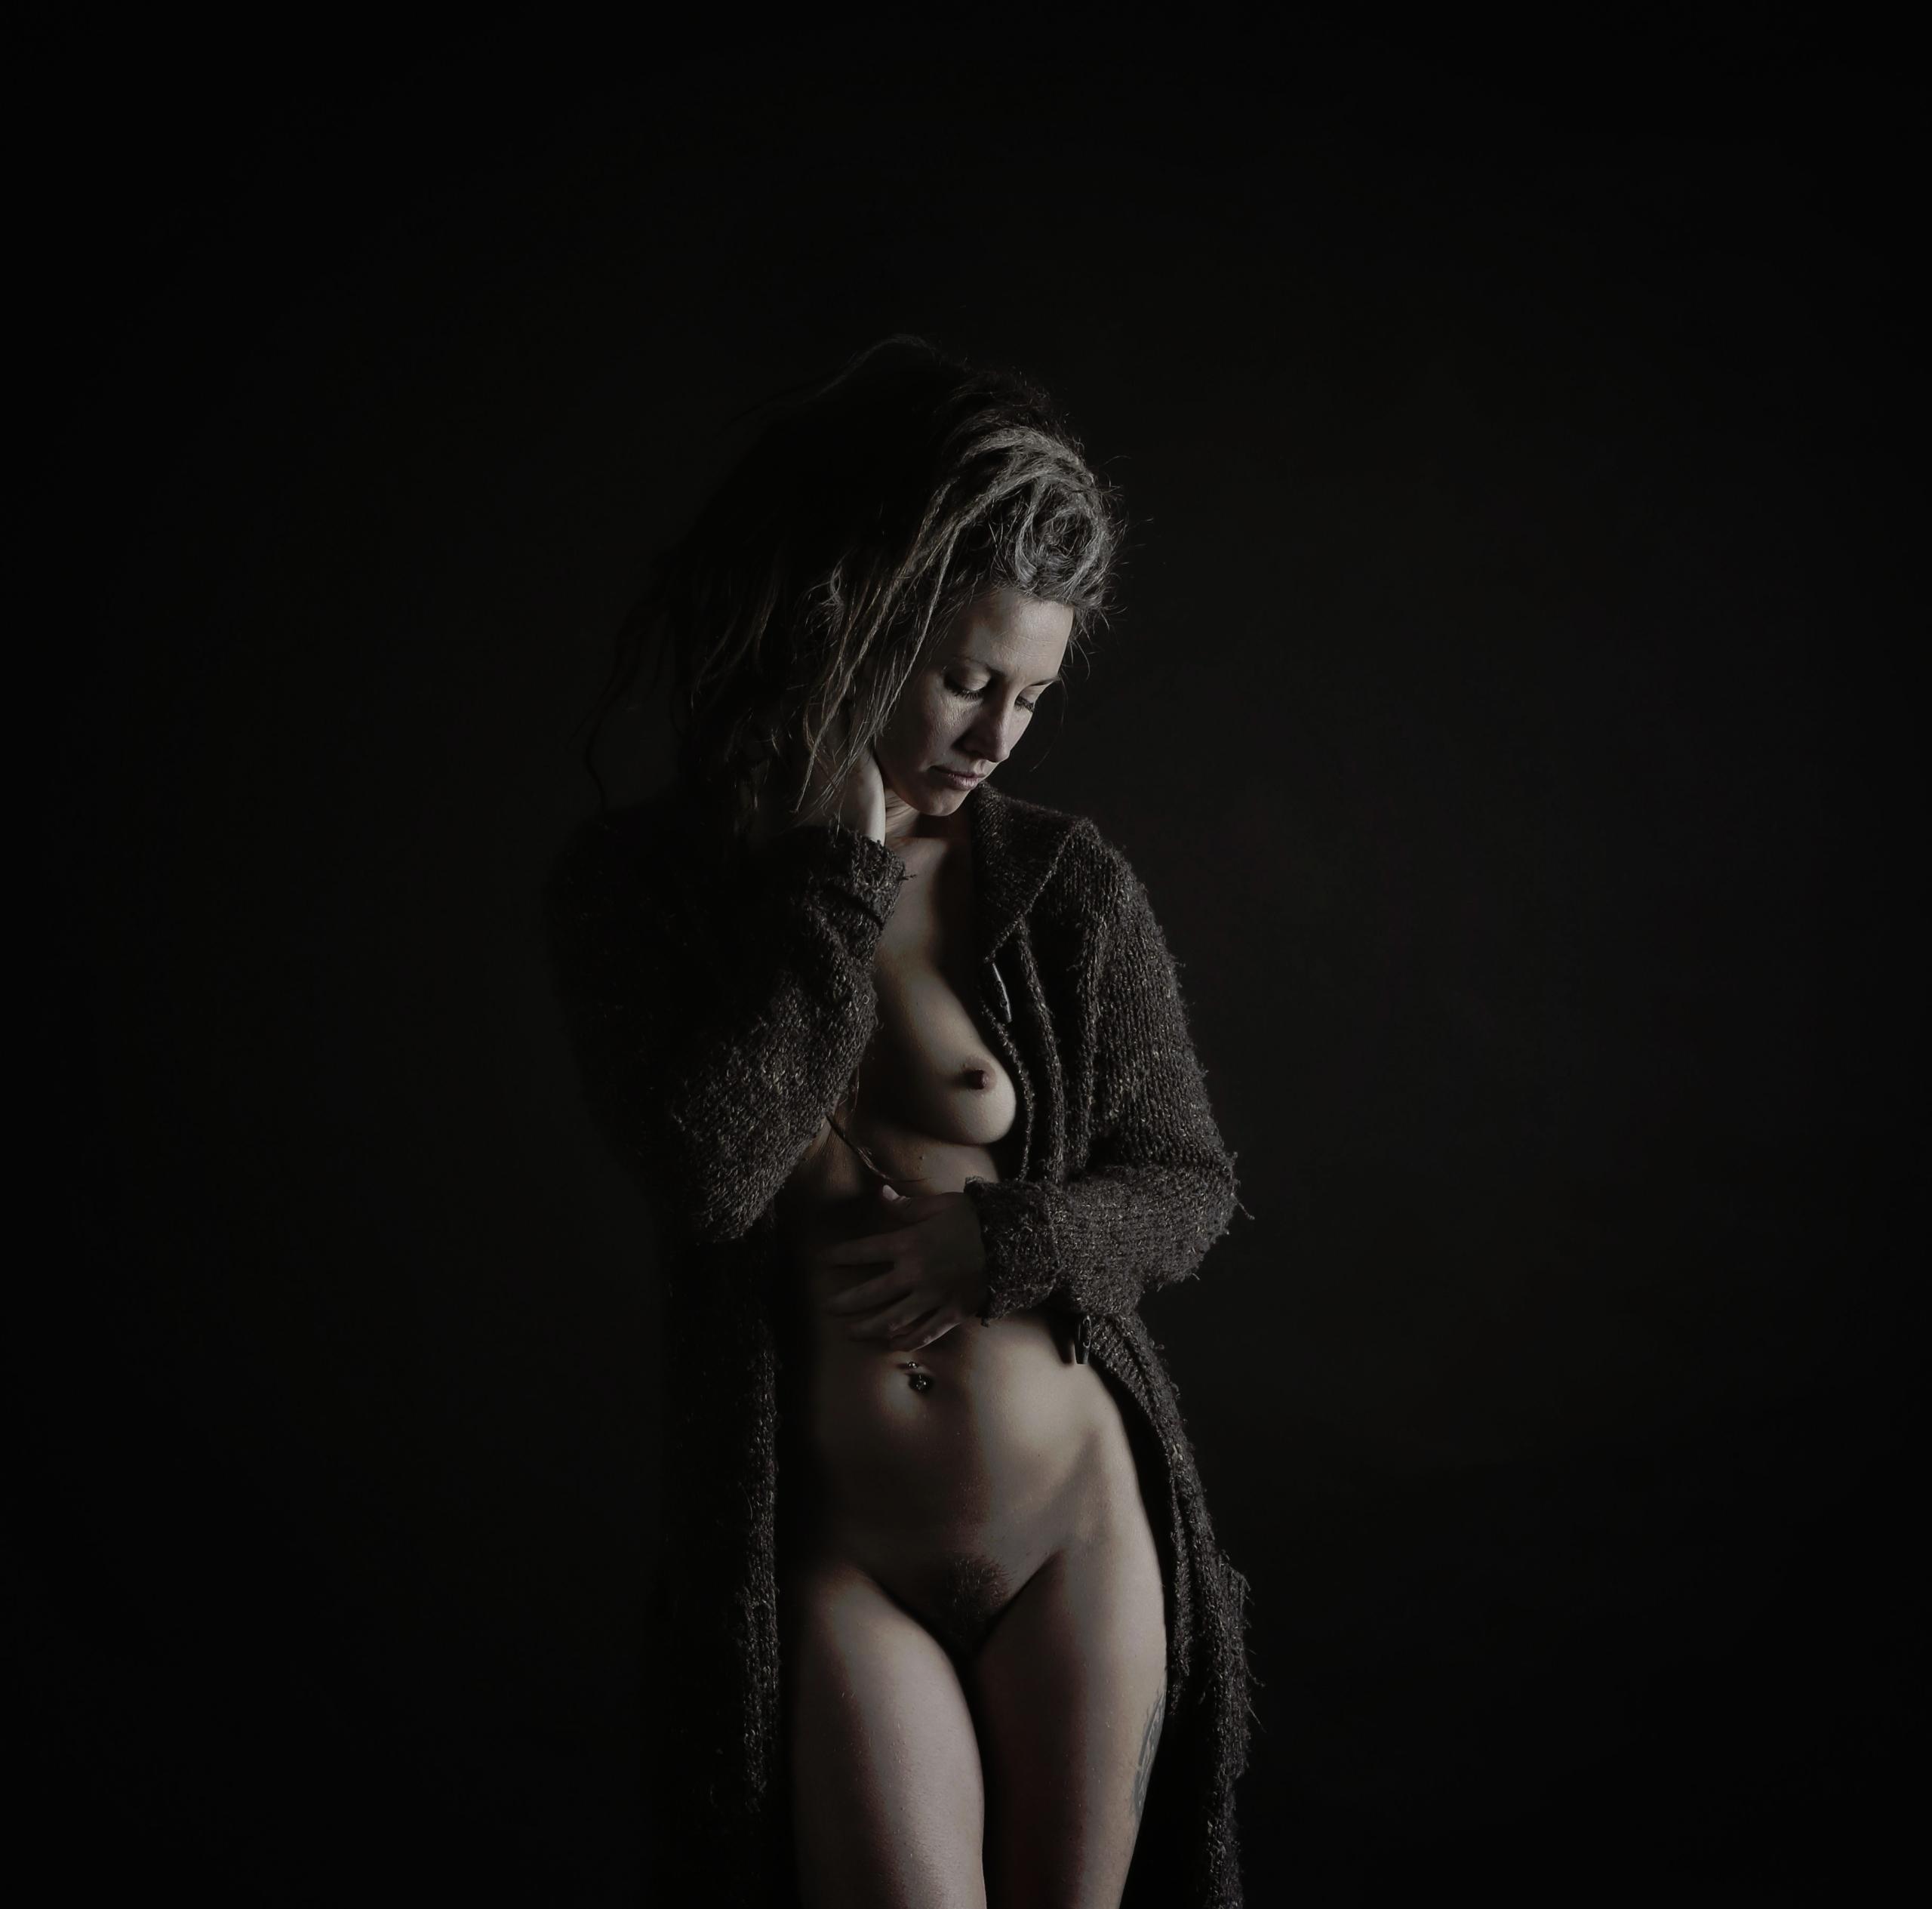 Model: Carey - DarkBeauty, DarkBeautyMag - stevelease | ello